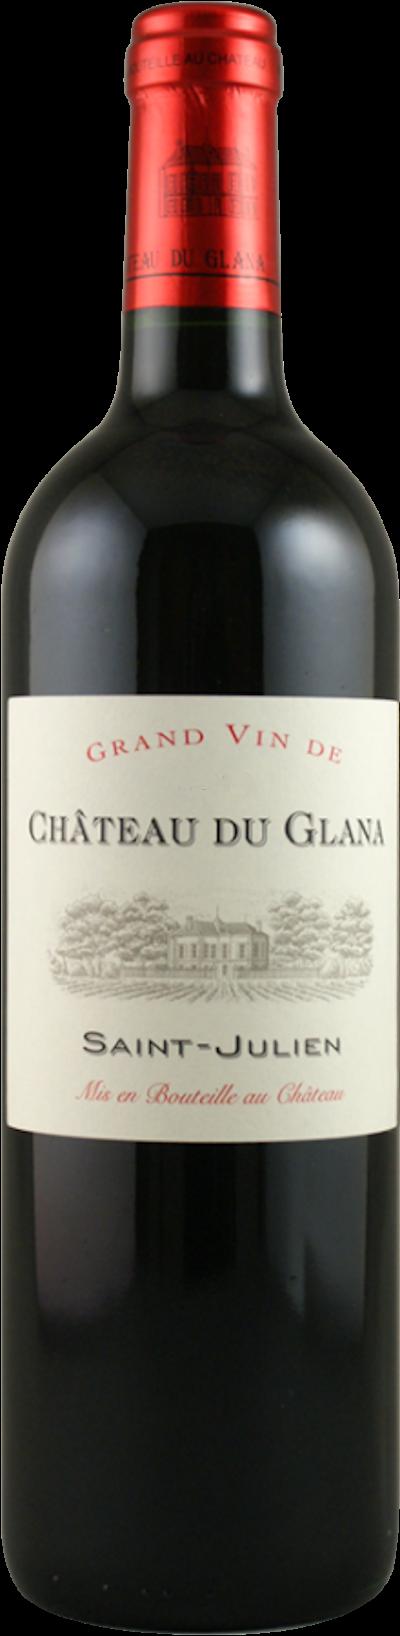 Cháteau du Glana - Saint Julien